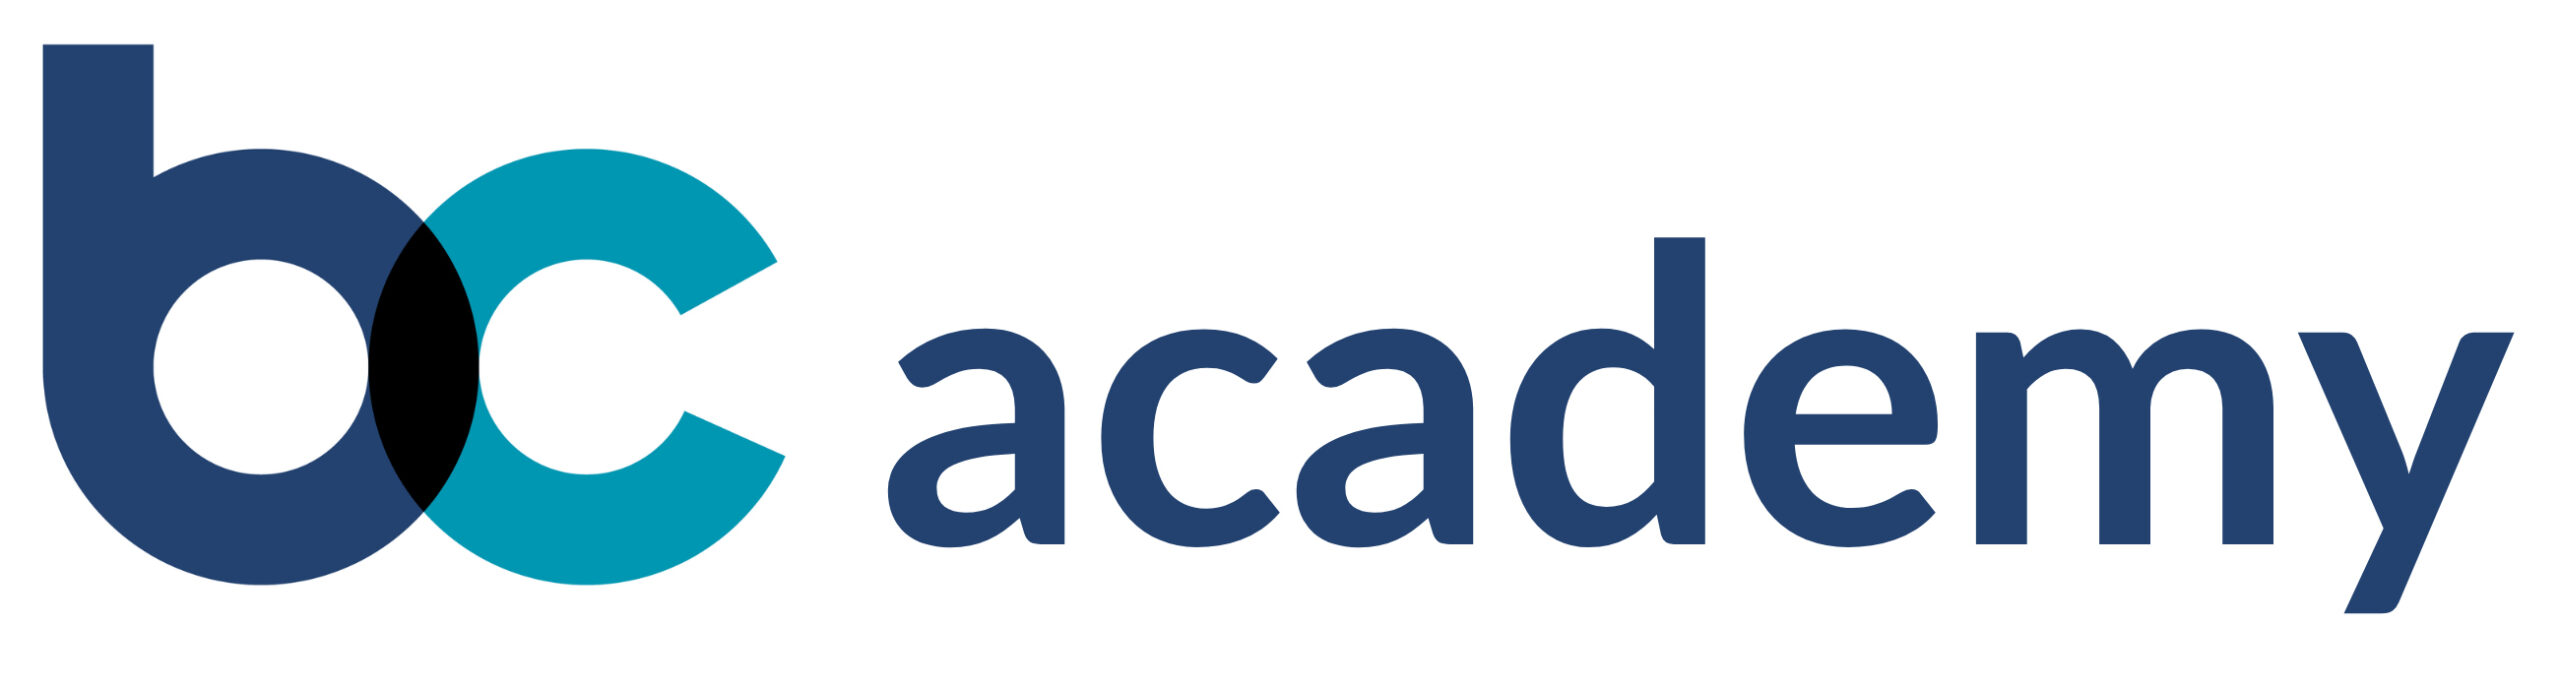 bc academy